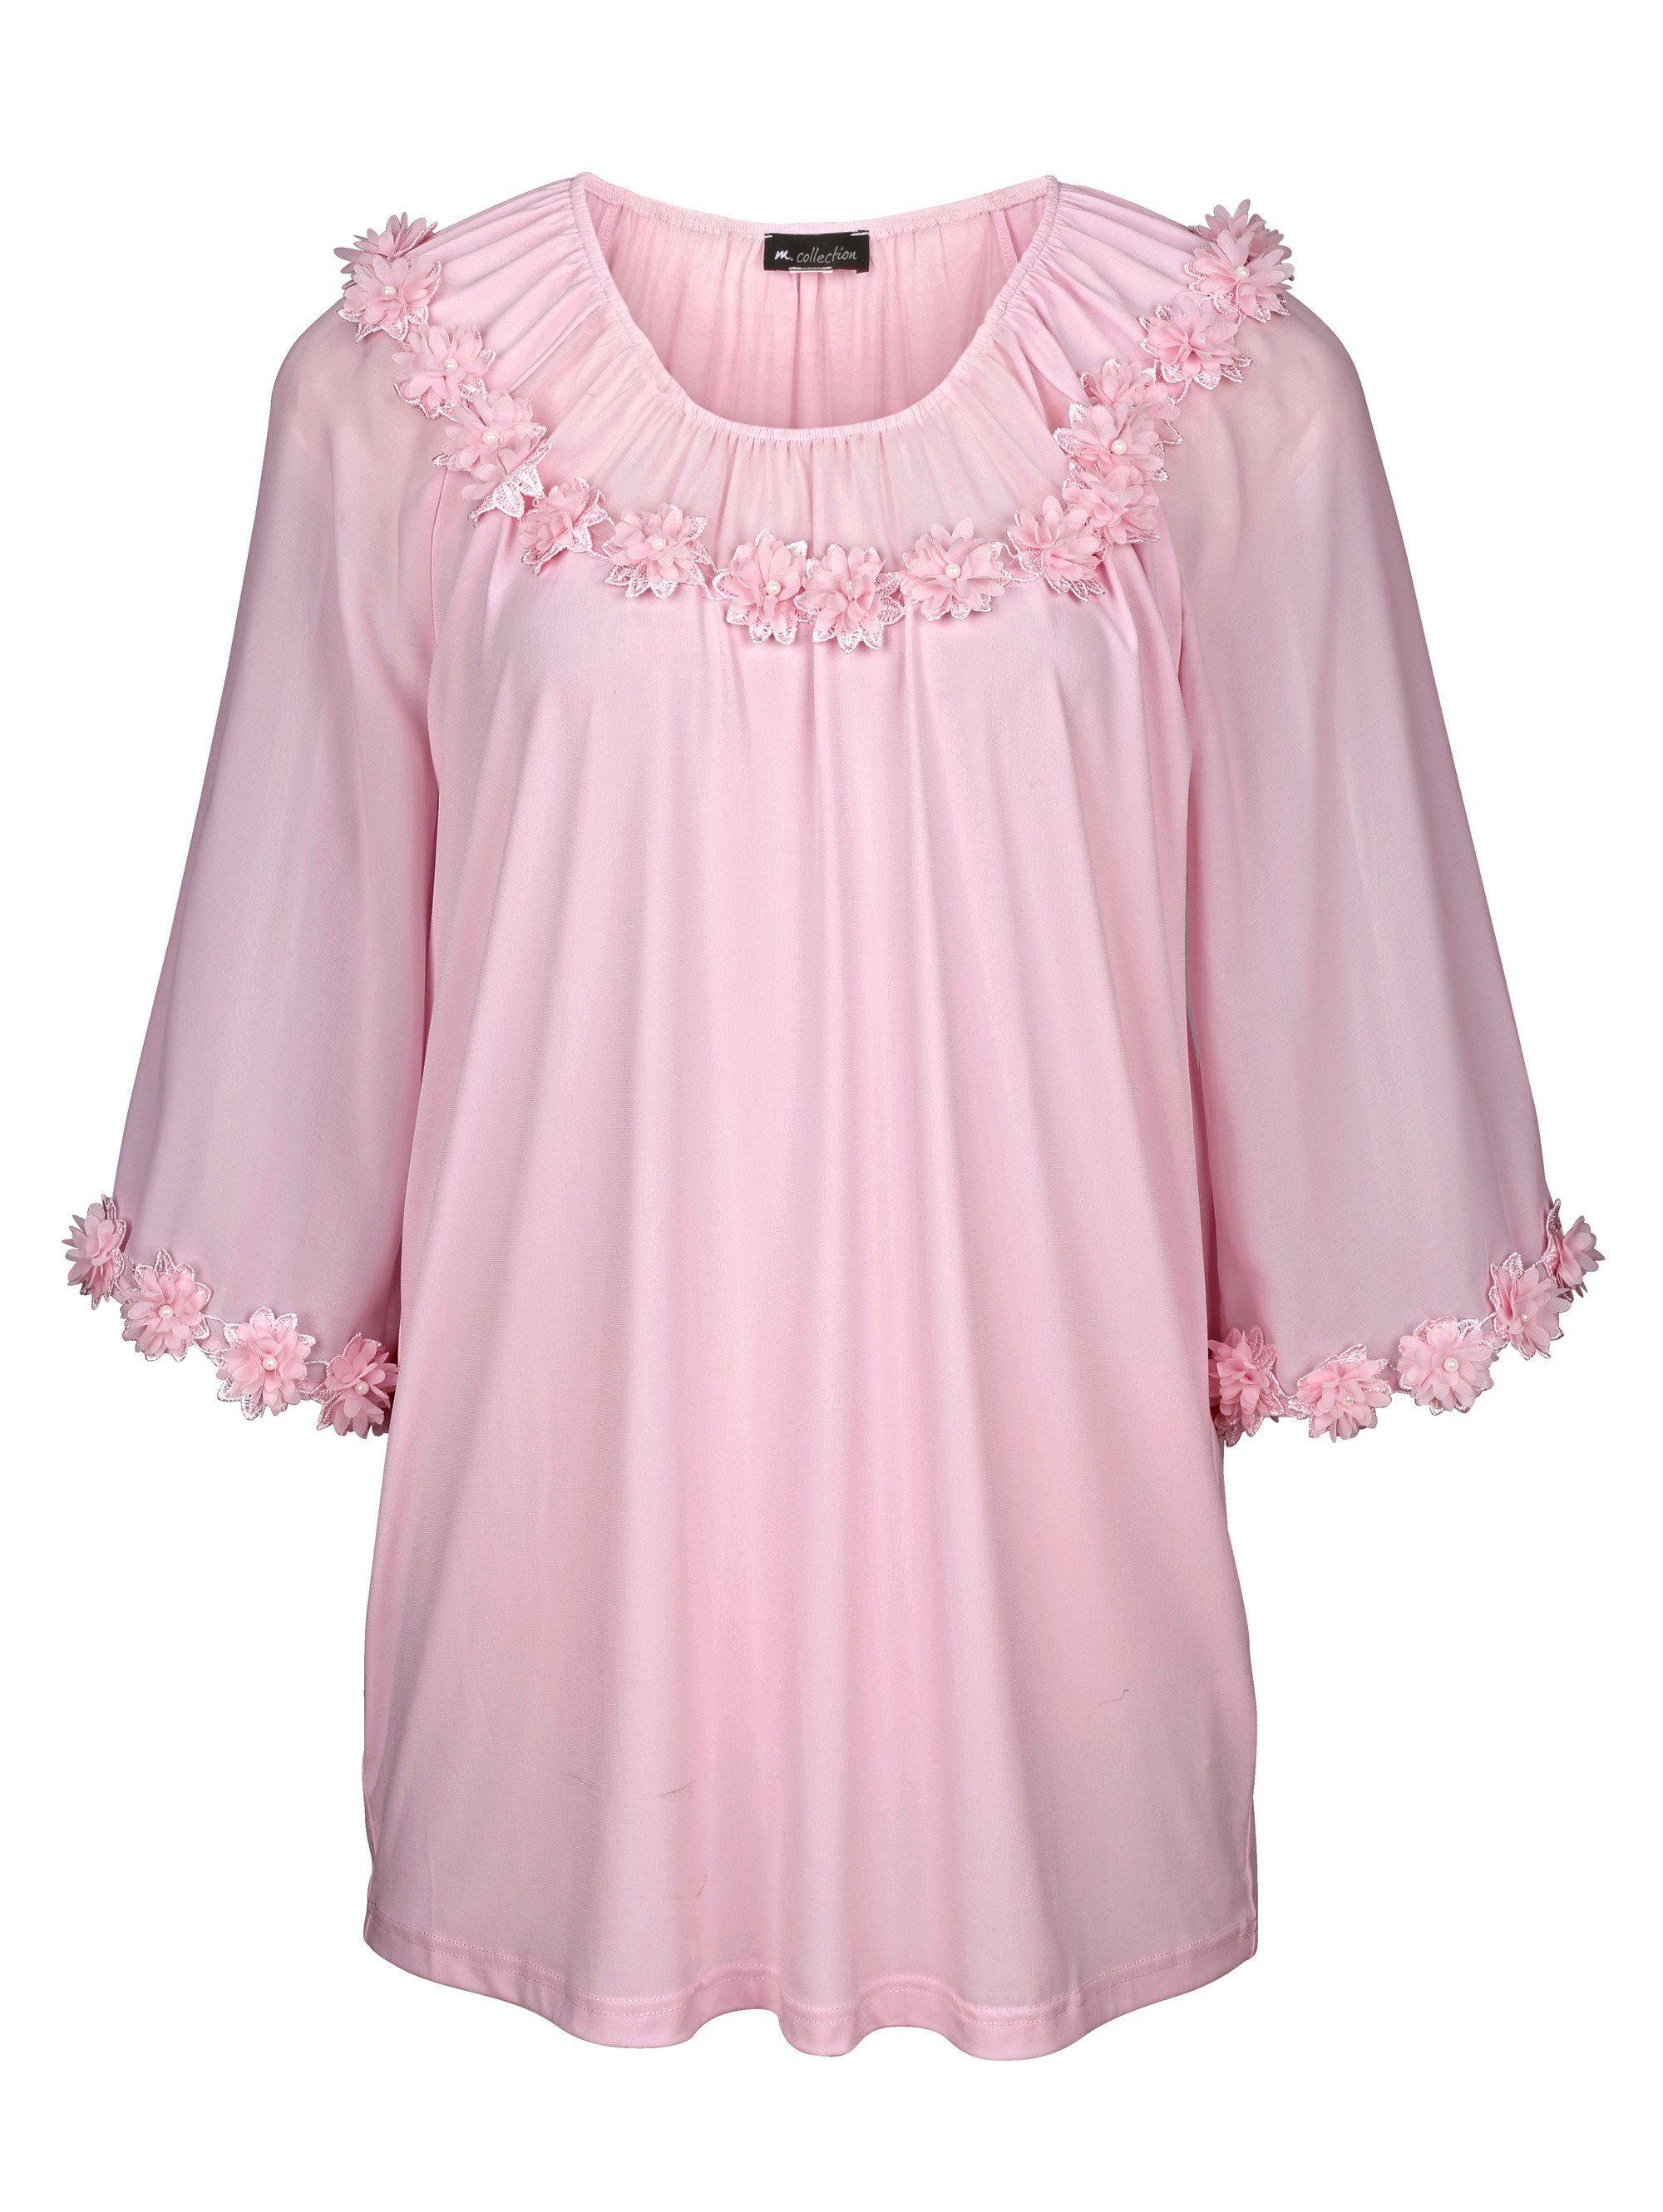 m. collection Shirt mit Dekoblümchen, rosa, Damen